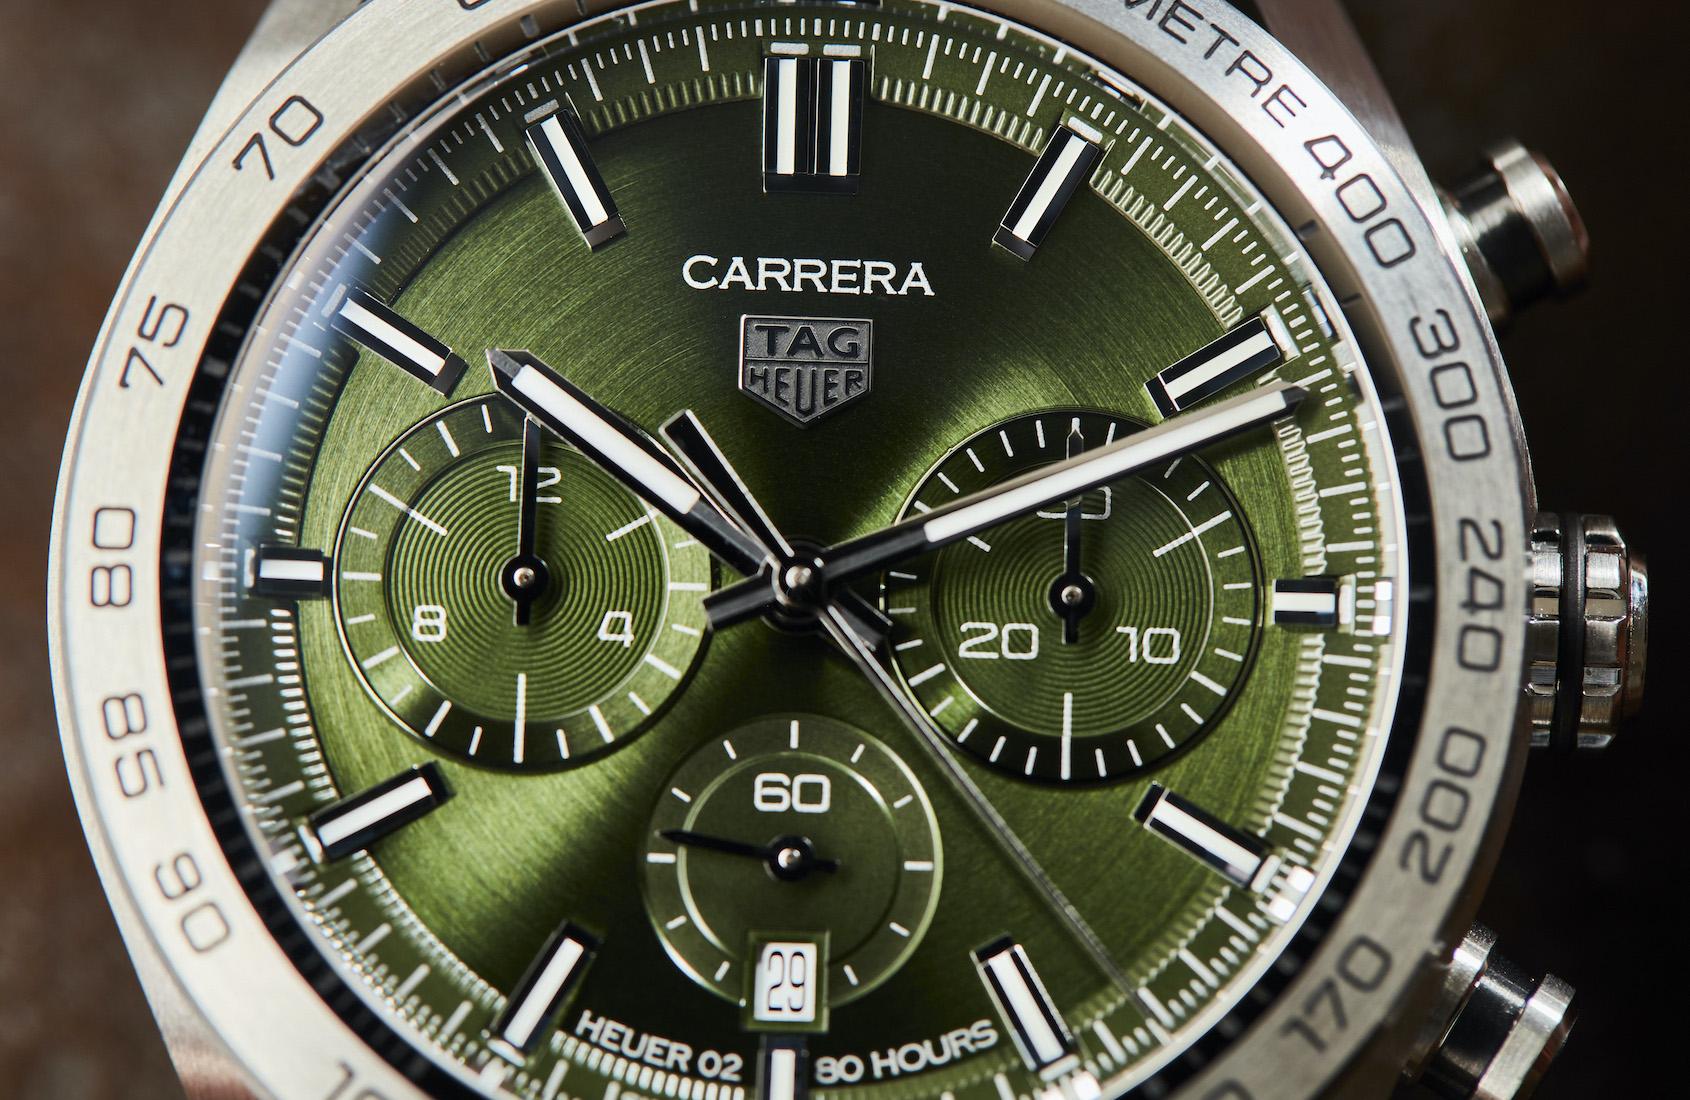 TAG Heuer Carrera Sport Chronograph green dial